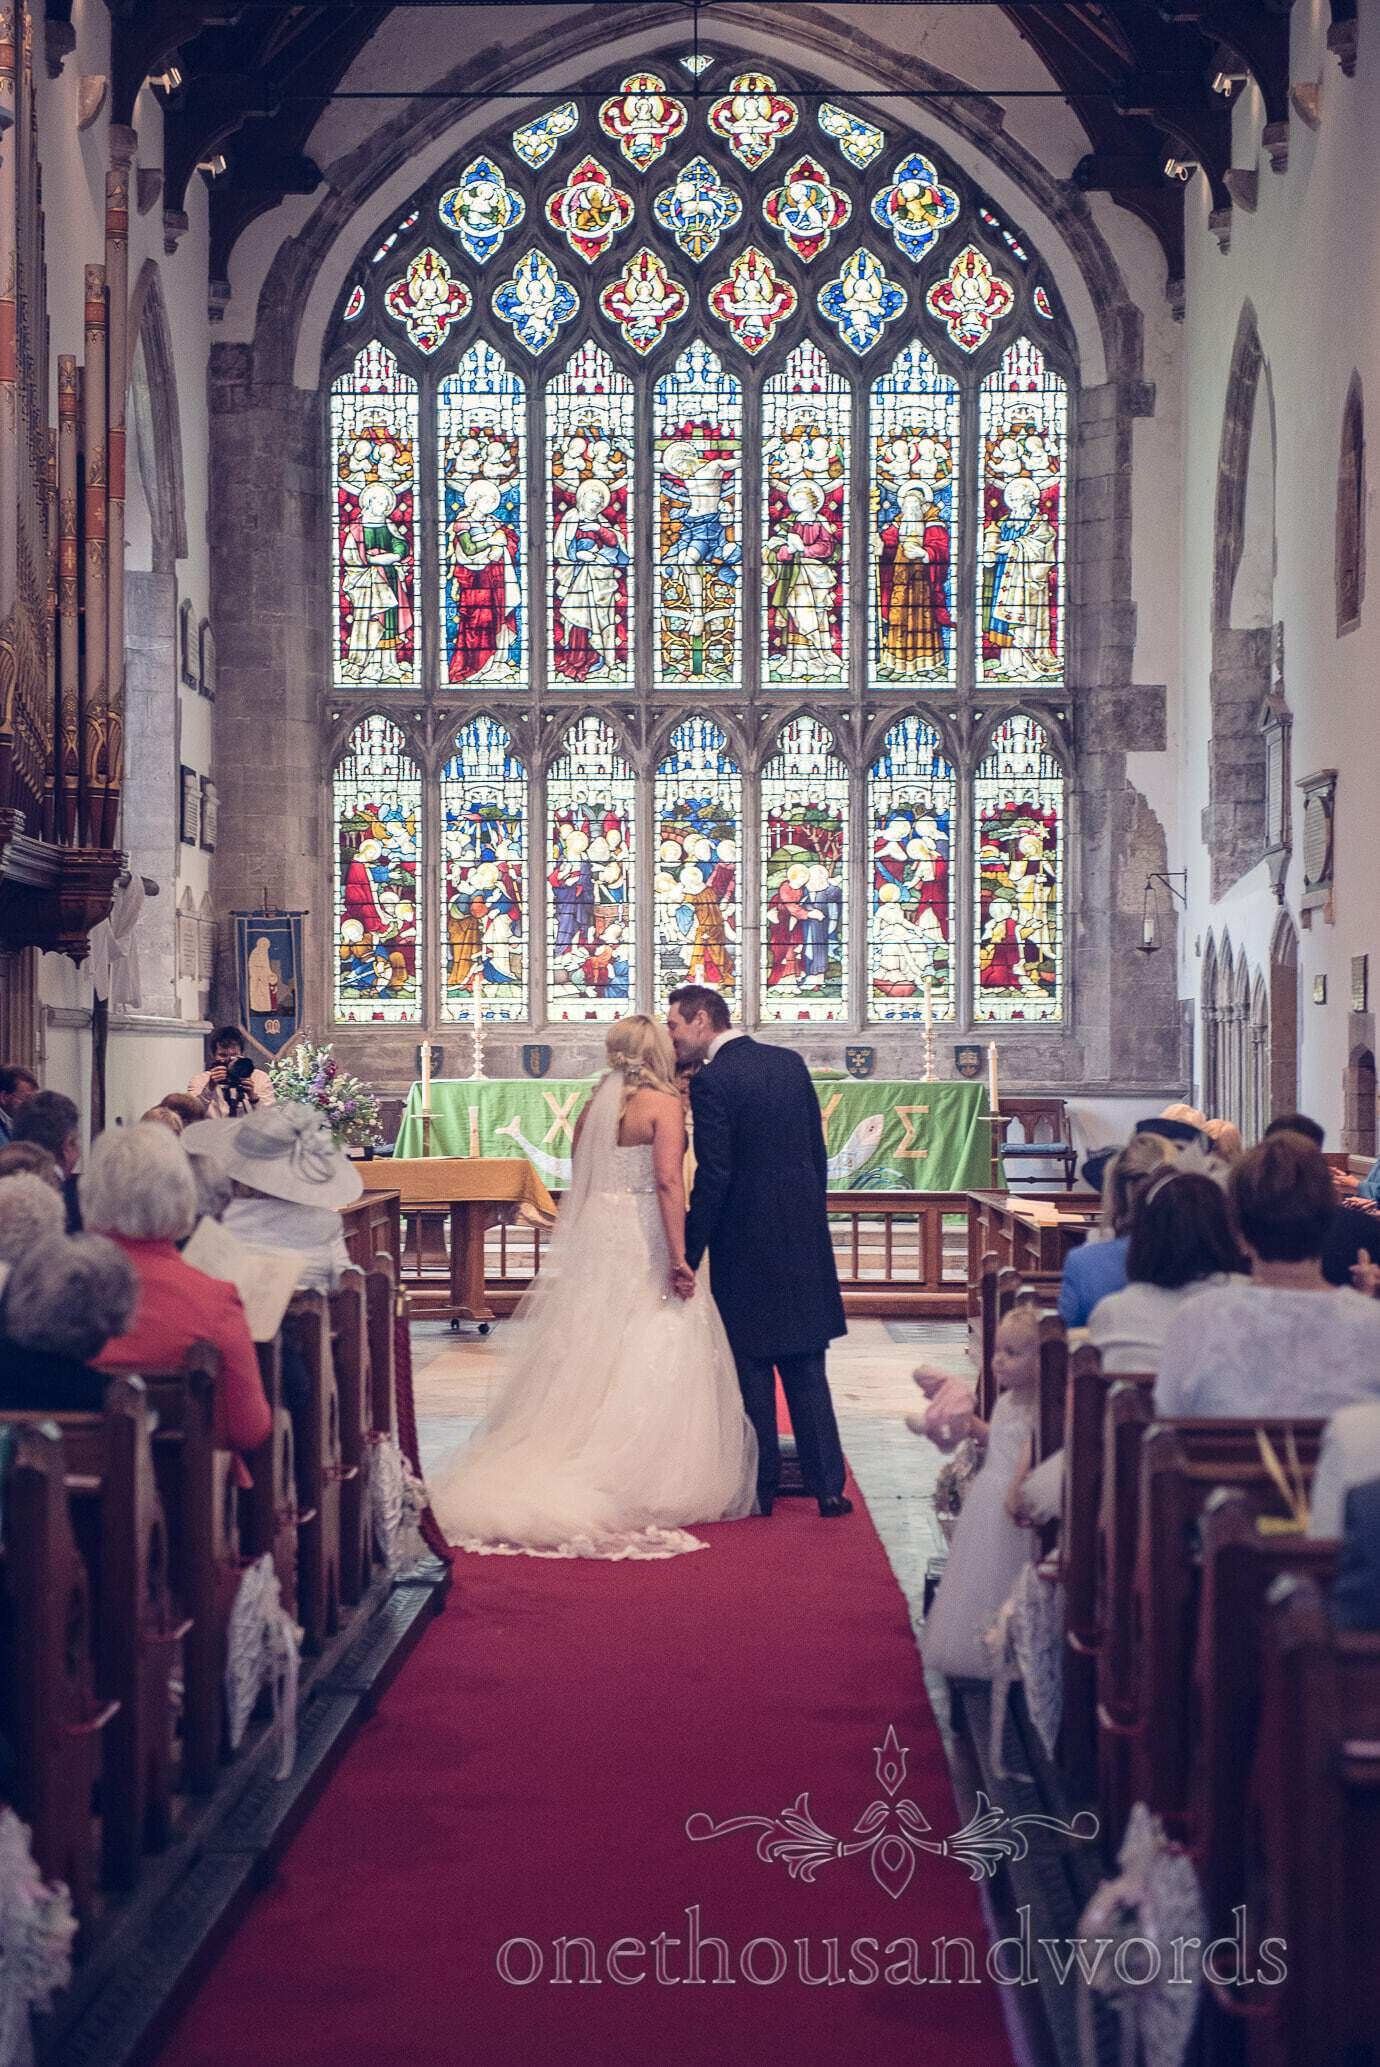 First kiss at St Marys church wedding in Wareham, Dorset